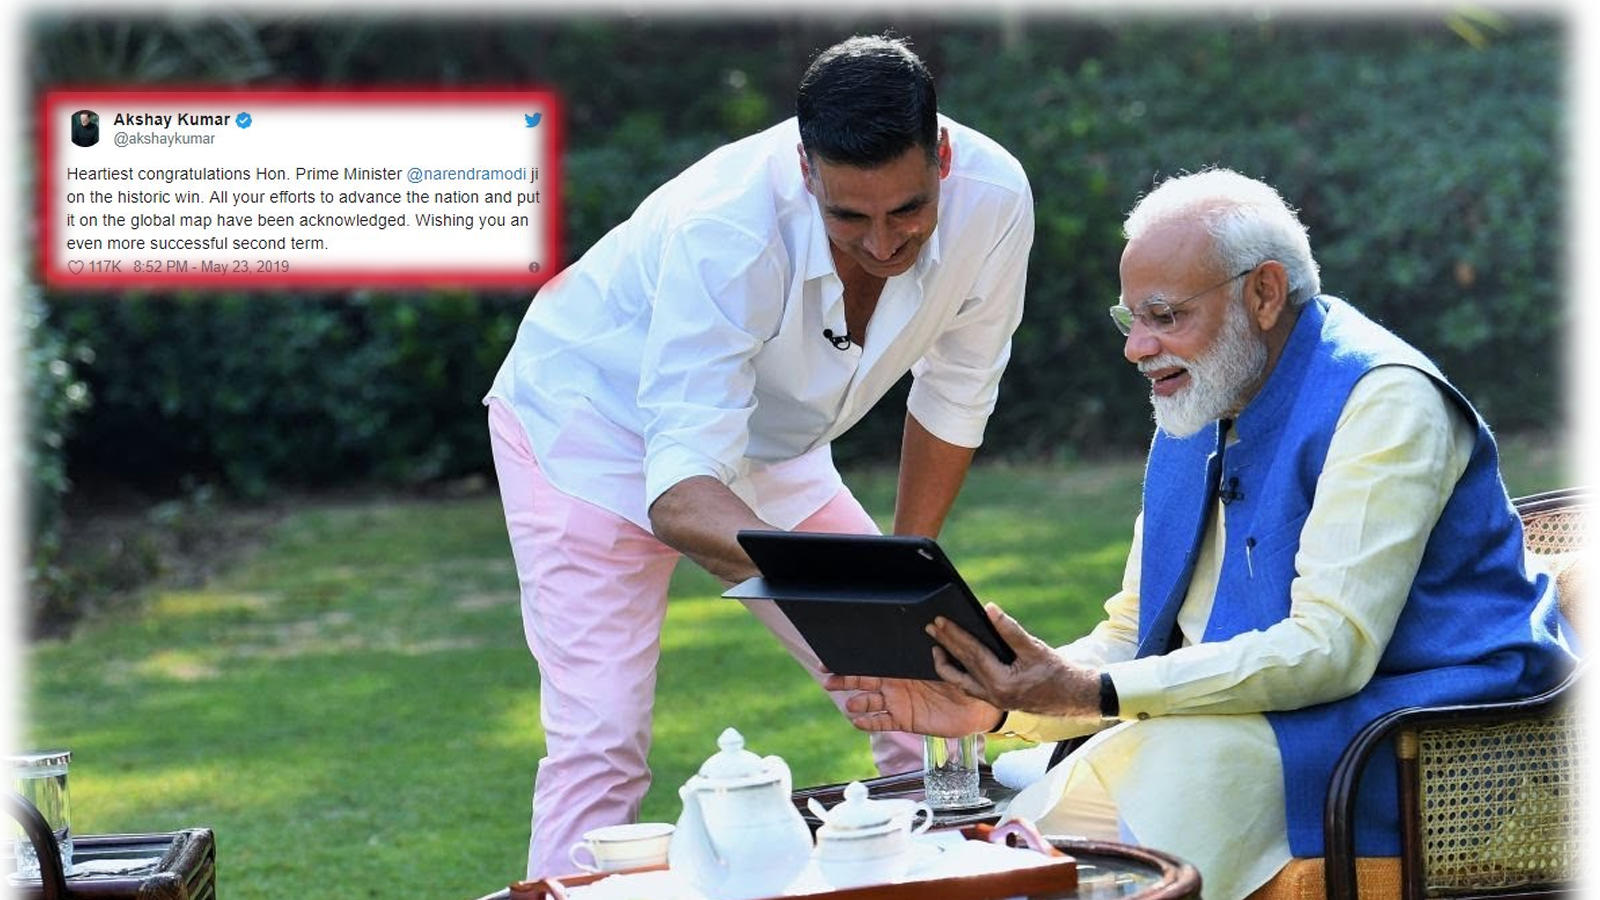 lok-sabha-polls-2019-akshay-kumar-congratulates-pm-narendra-modi-over-his-historic-win